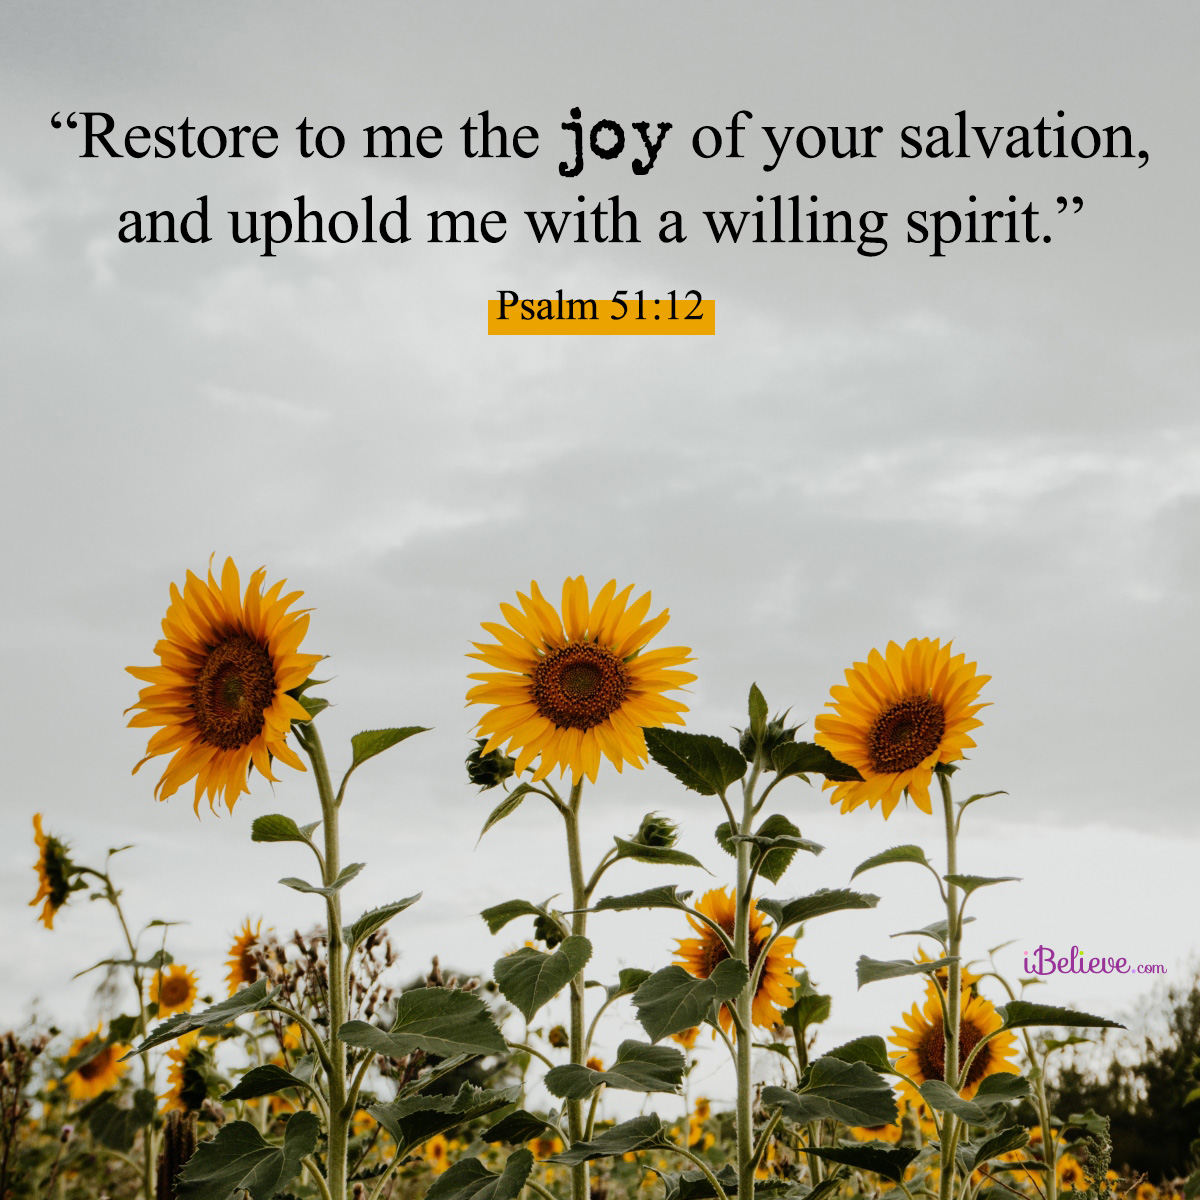 Psalm 51:12, inspirational image